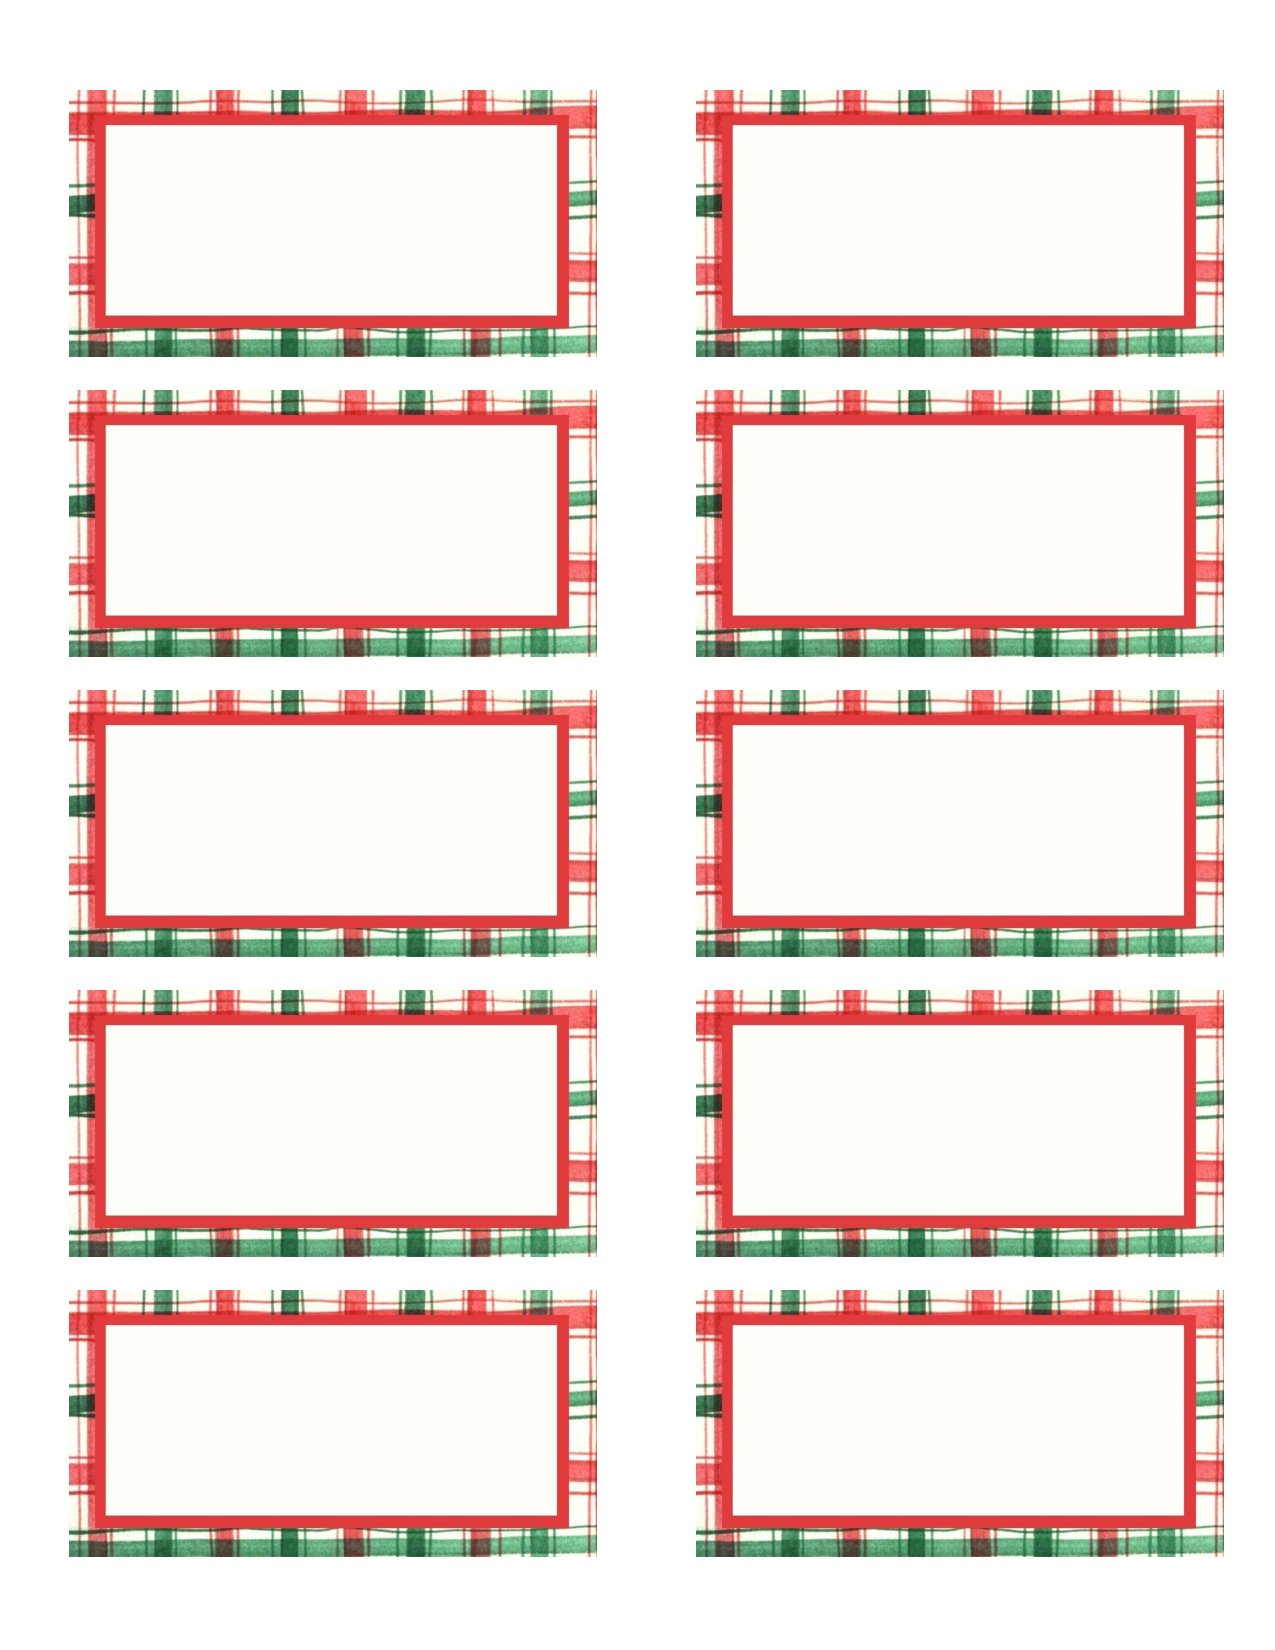 014 Printable Gift Tags Templates Template Shocking Ideas Thank You - Free Printable Gift Tags Templates